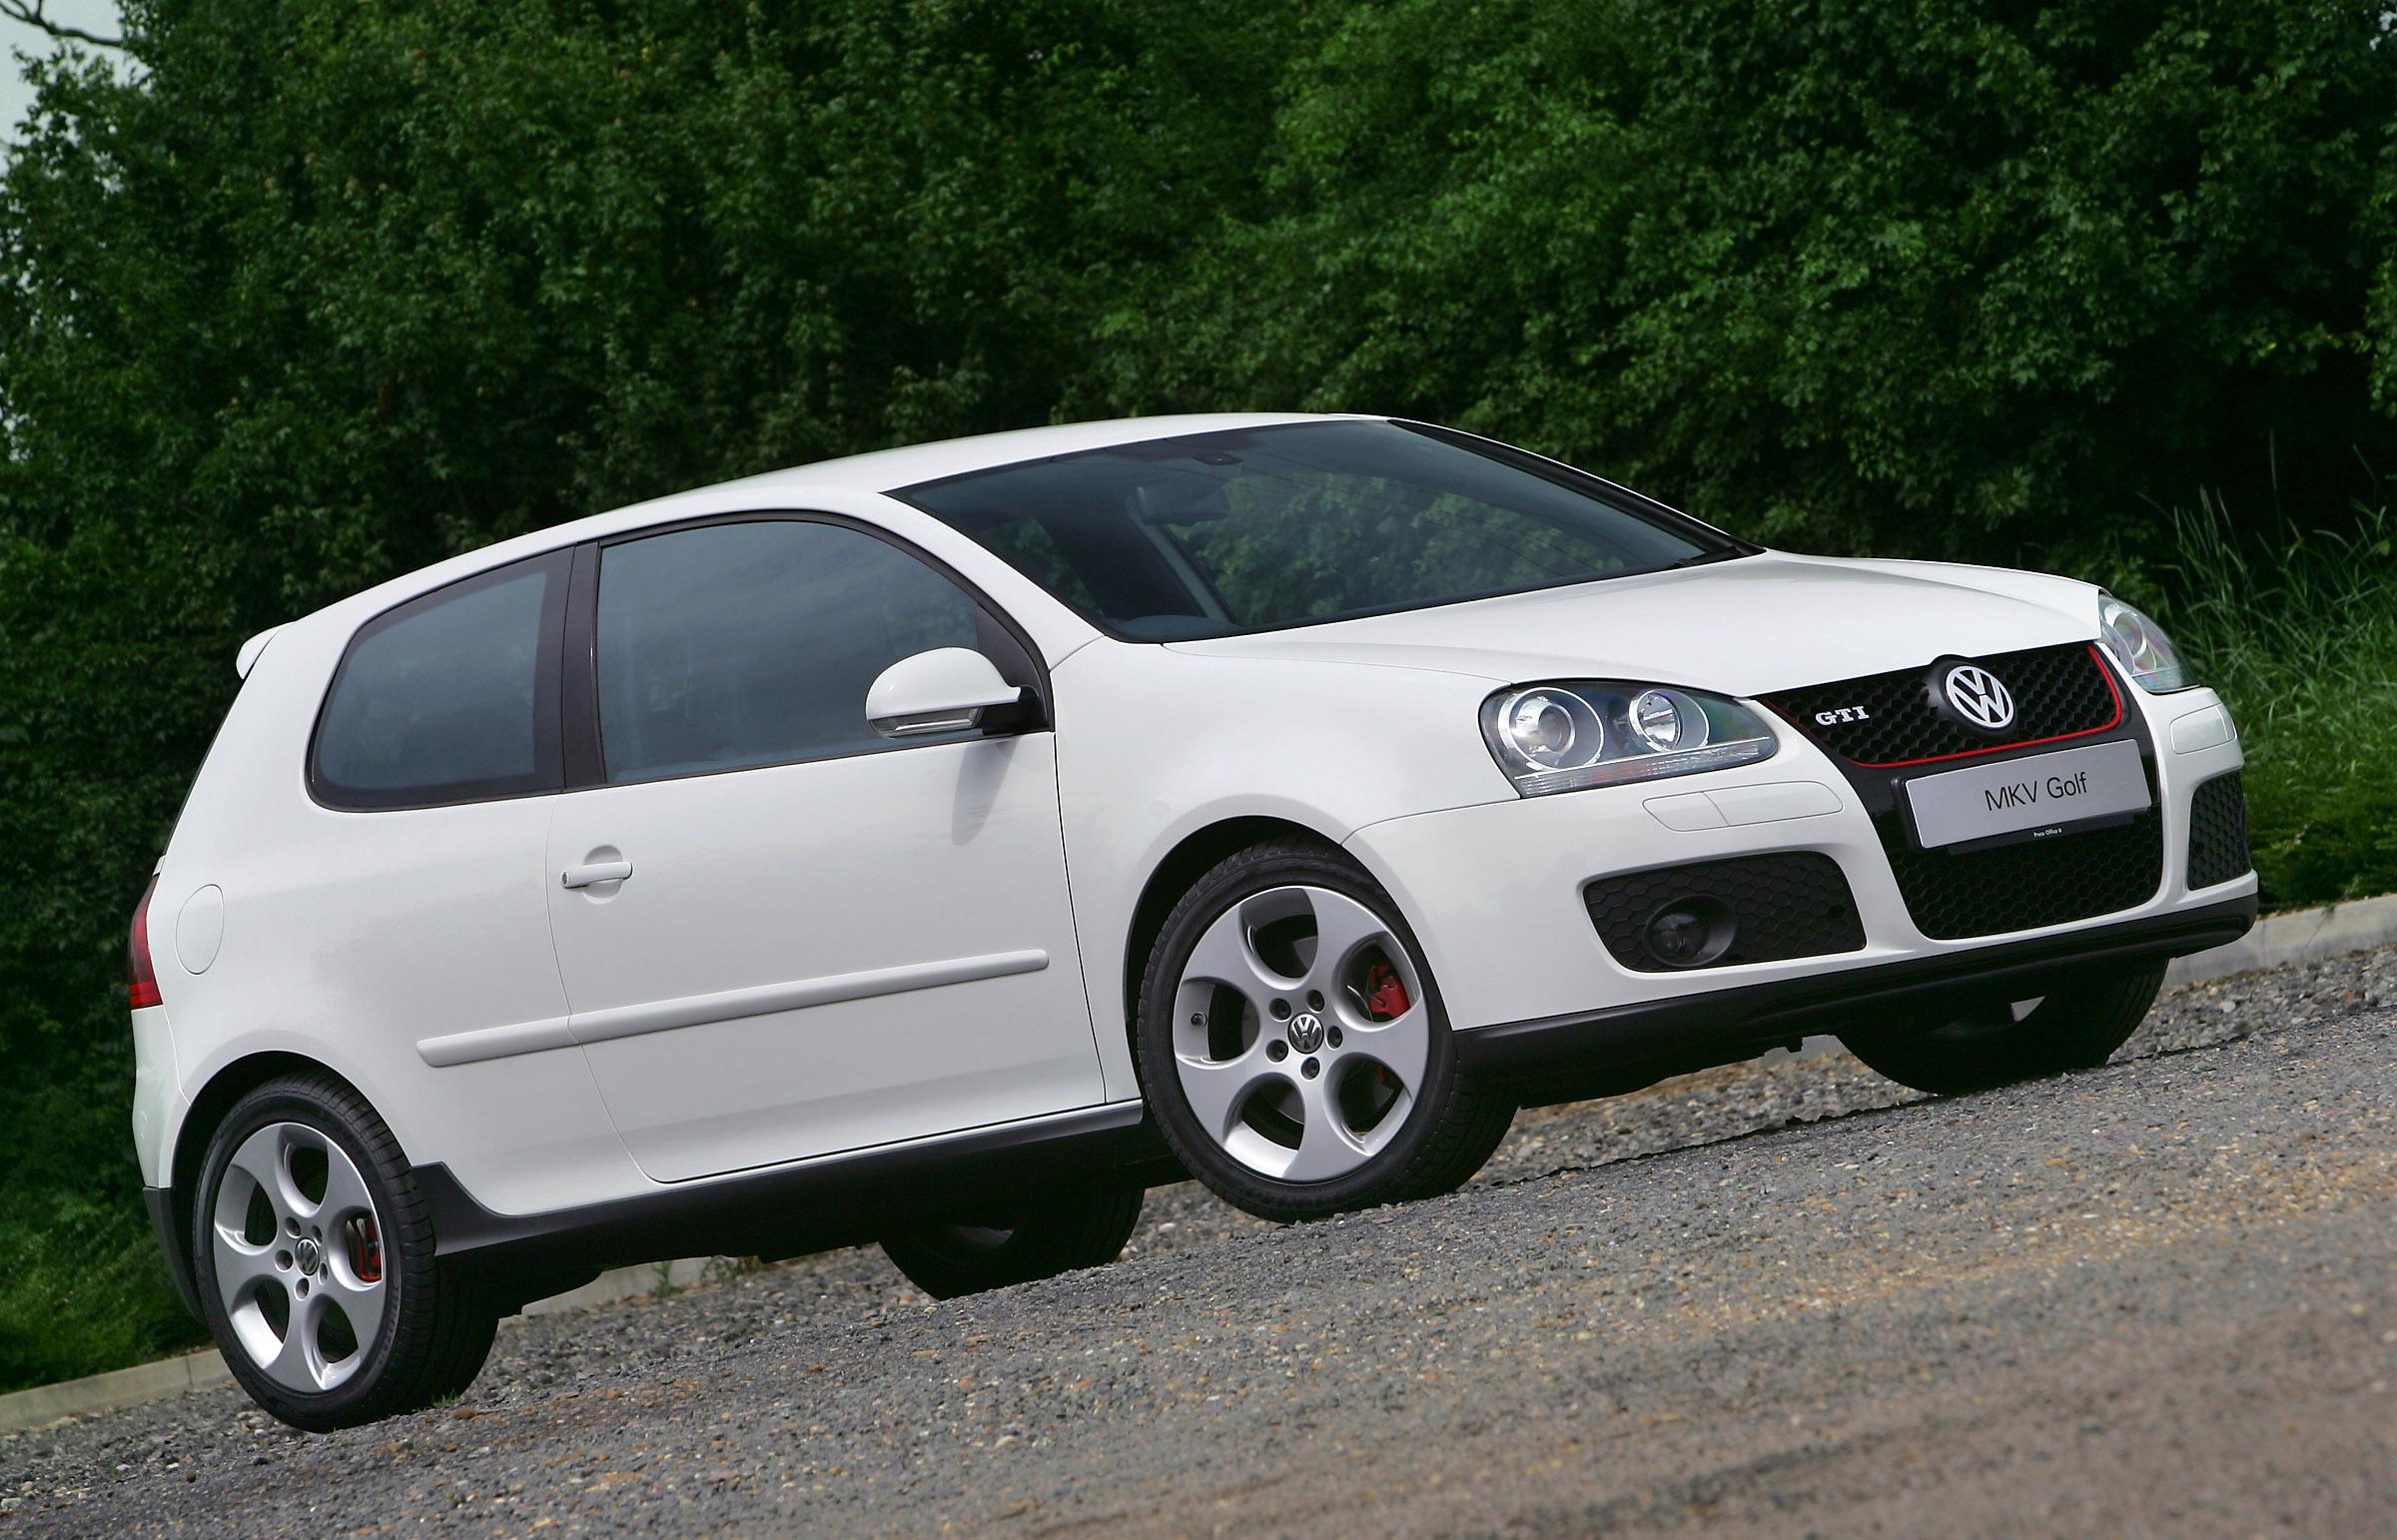 2005 Volkswagen Golf GTI Mk V - Picture 71964